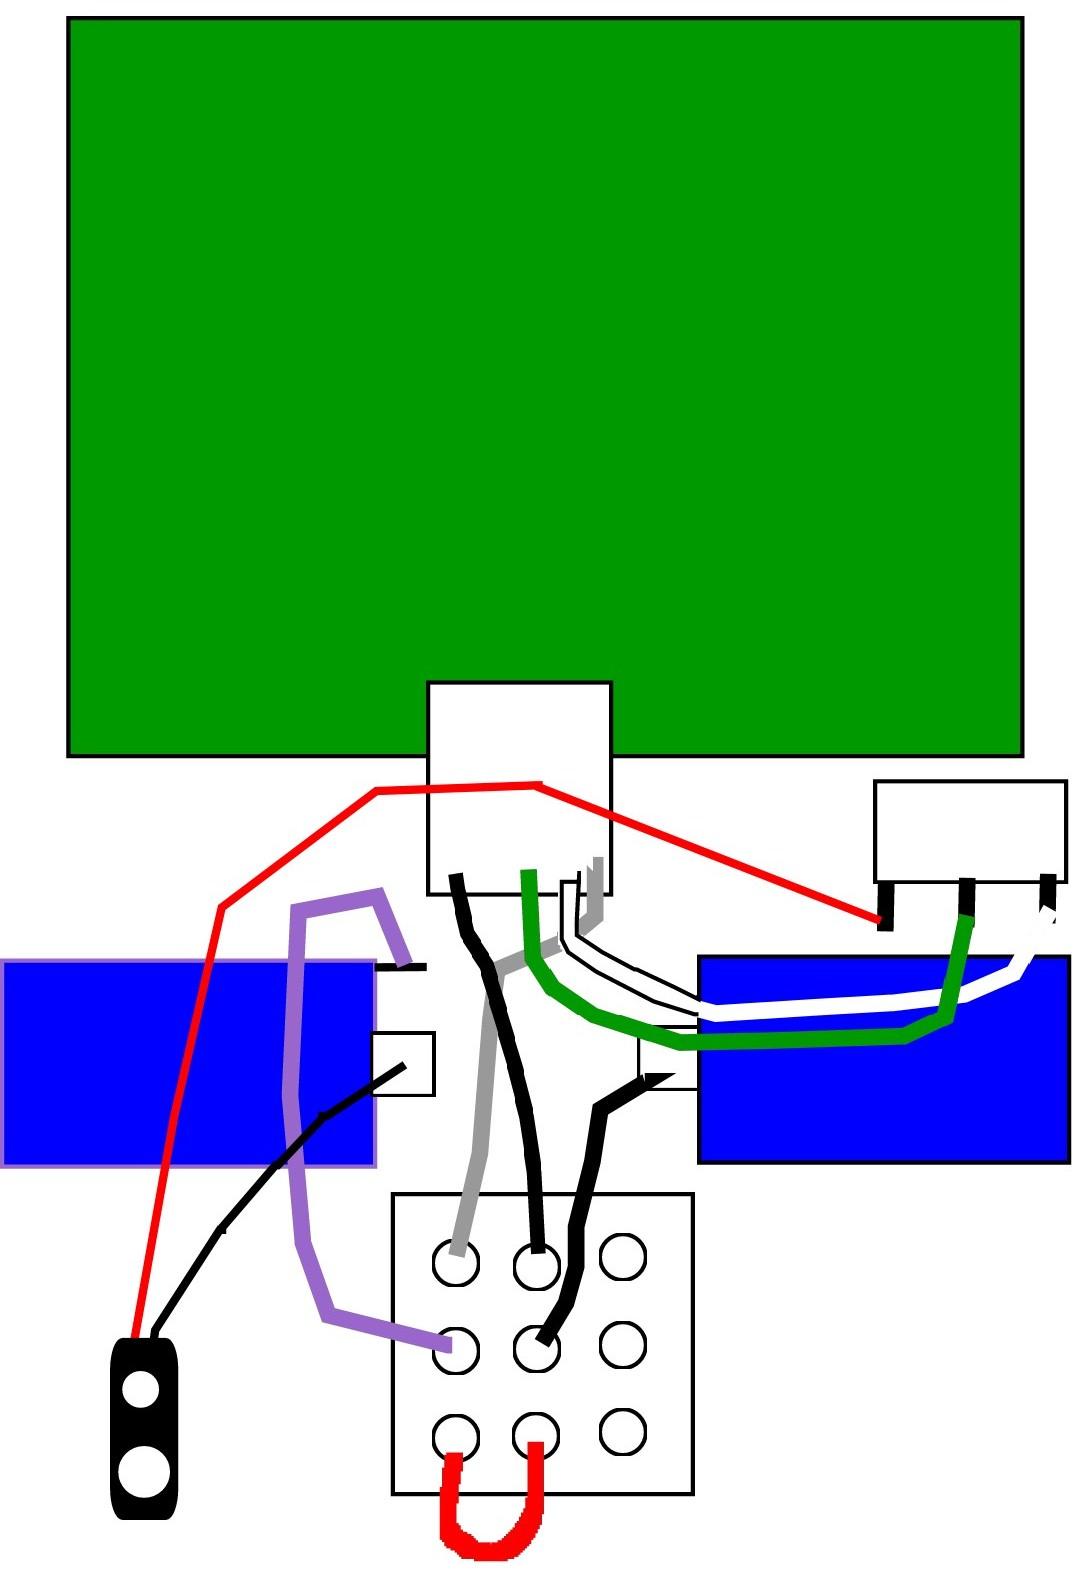 medium resolution of 2 sd hoist wiring diagram electric pallet jack diagram yale cpv hoist wiring diagram yale electric chain hoist wiring diagram